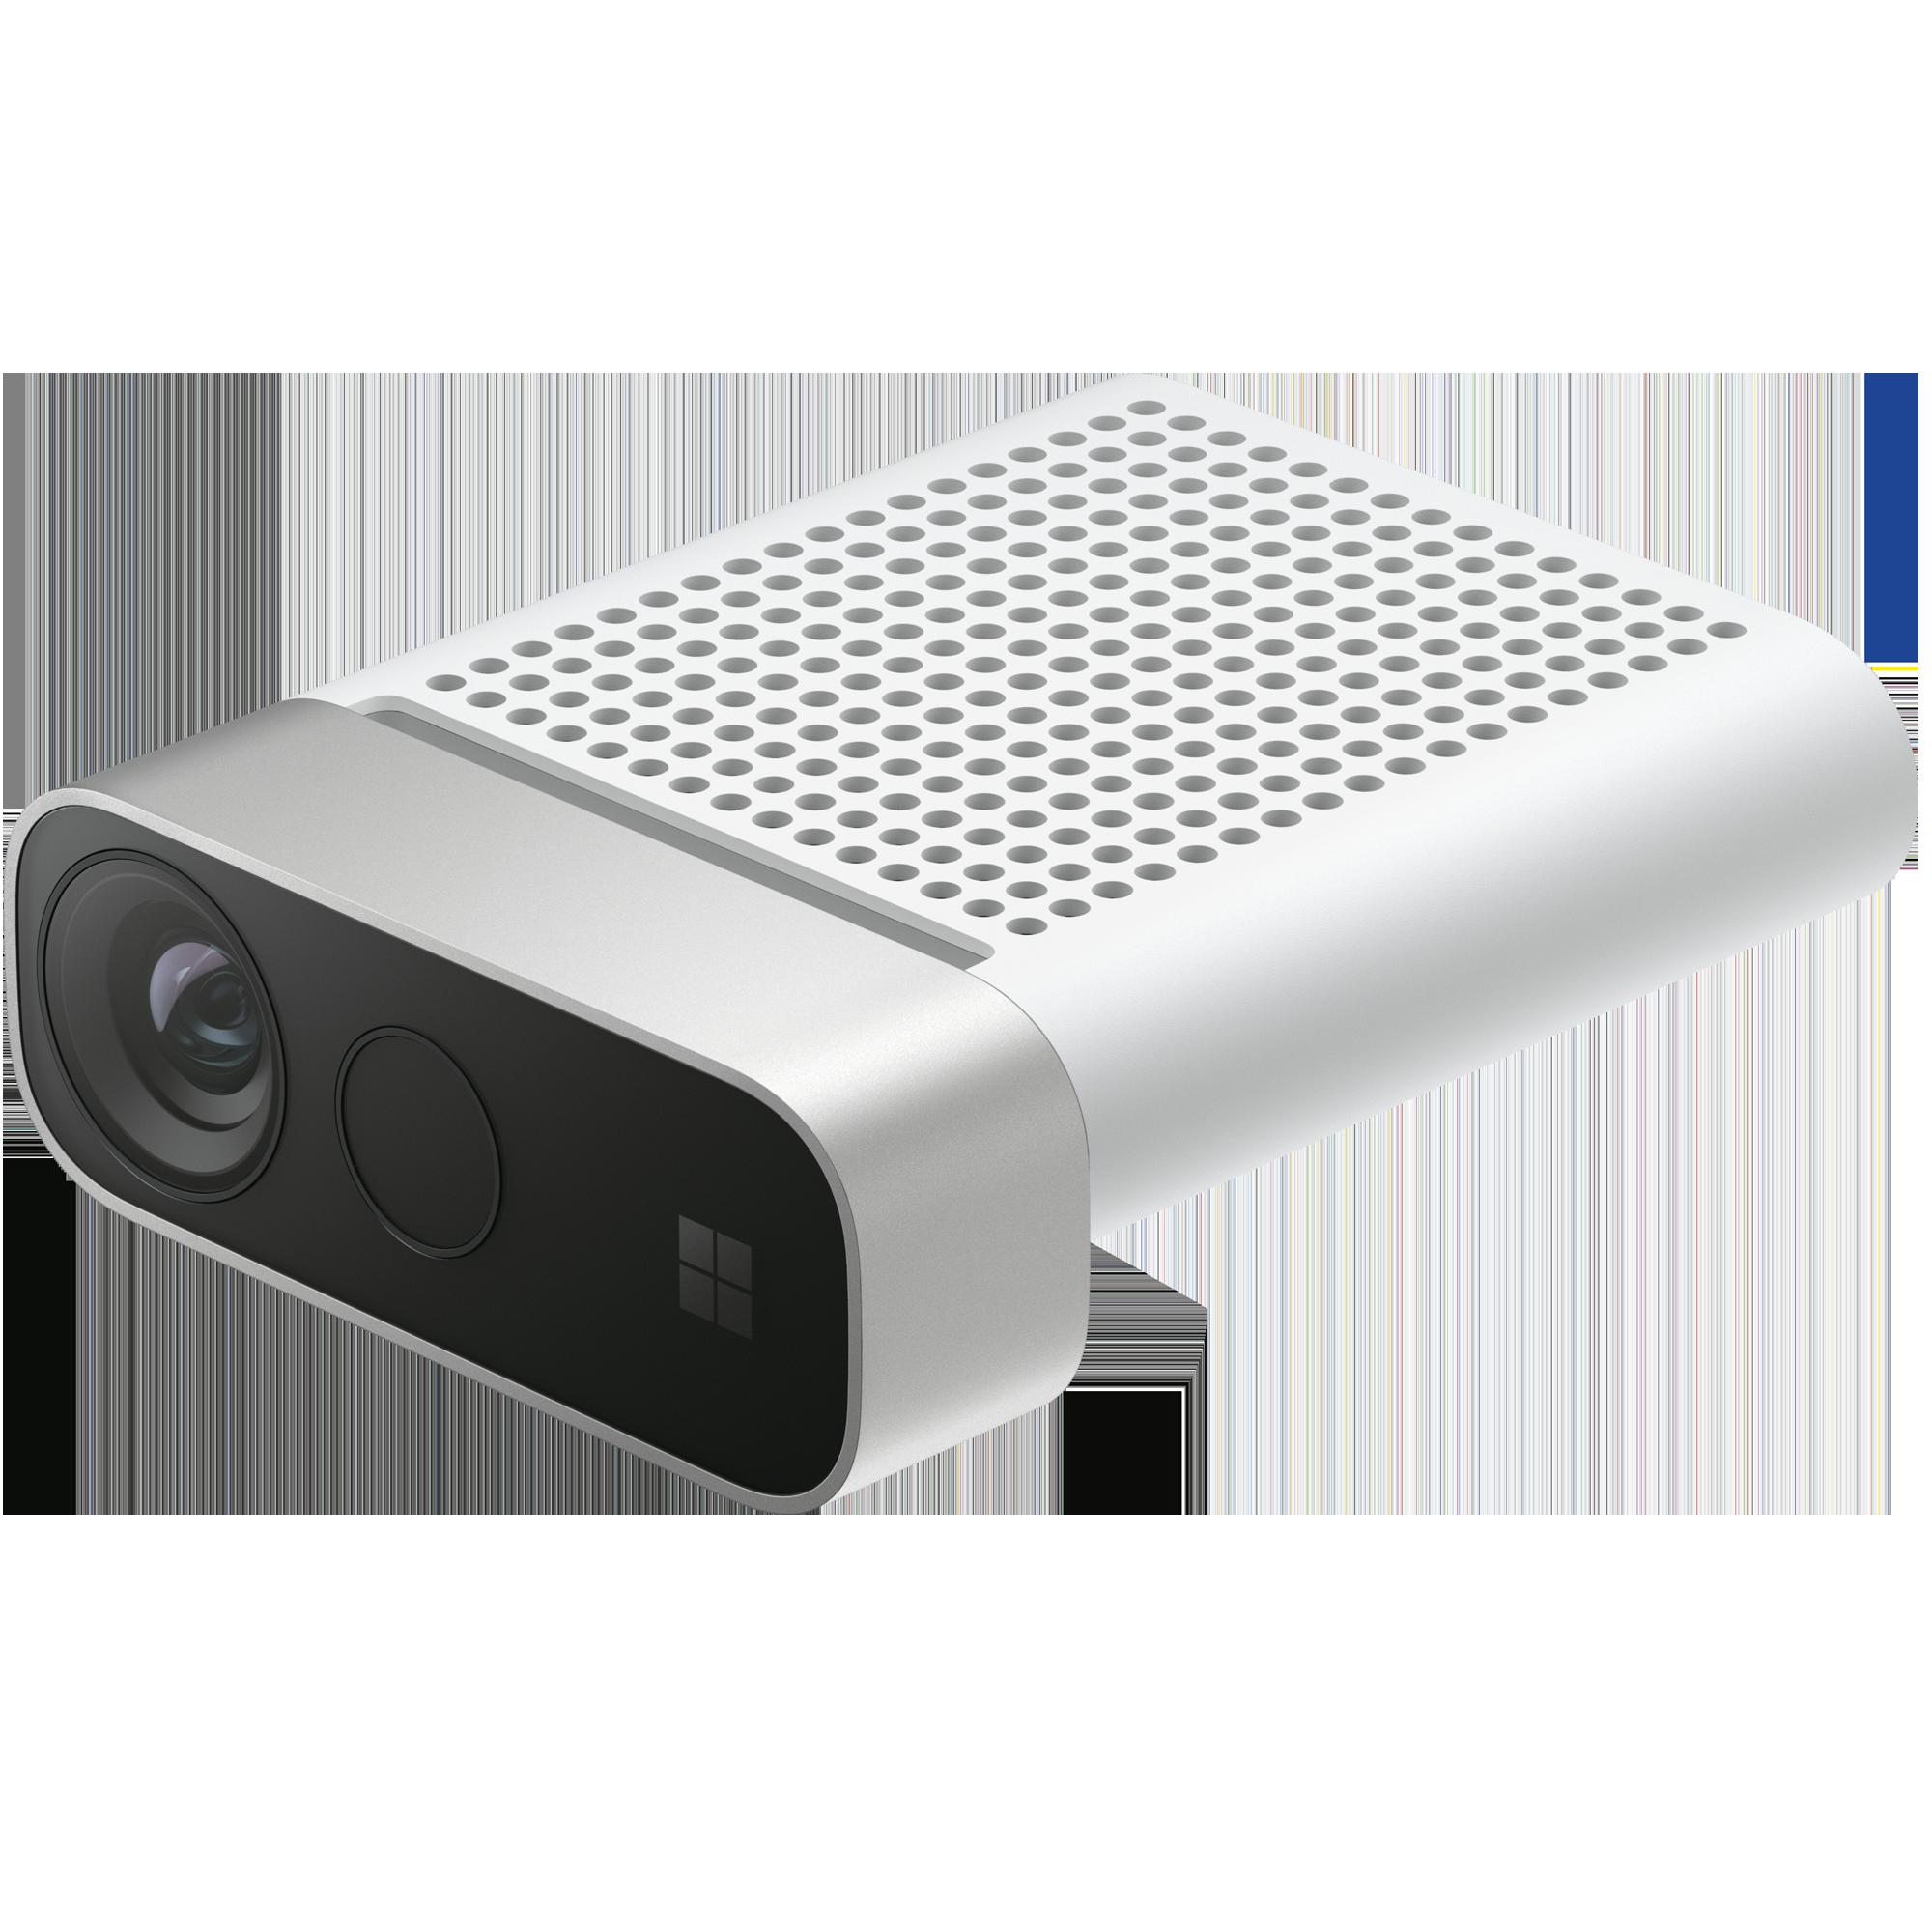 Buy the Azure Kinect developer kit – Microsoft